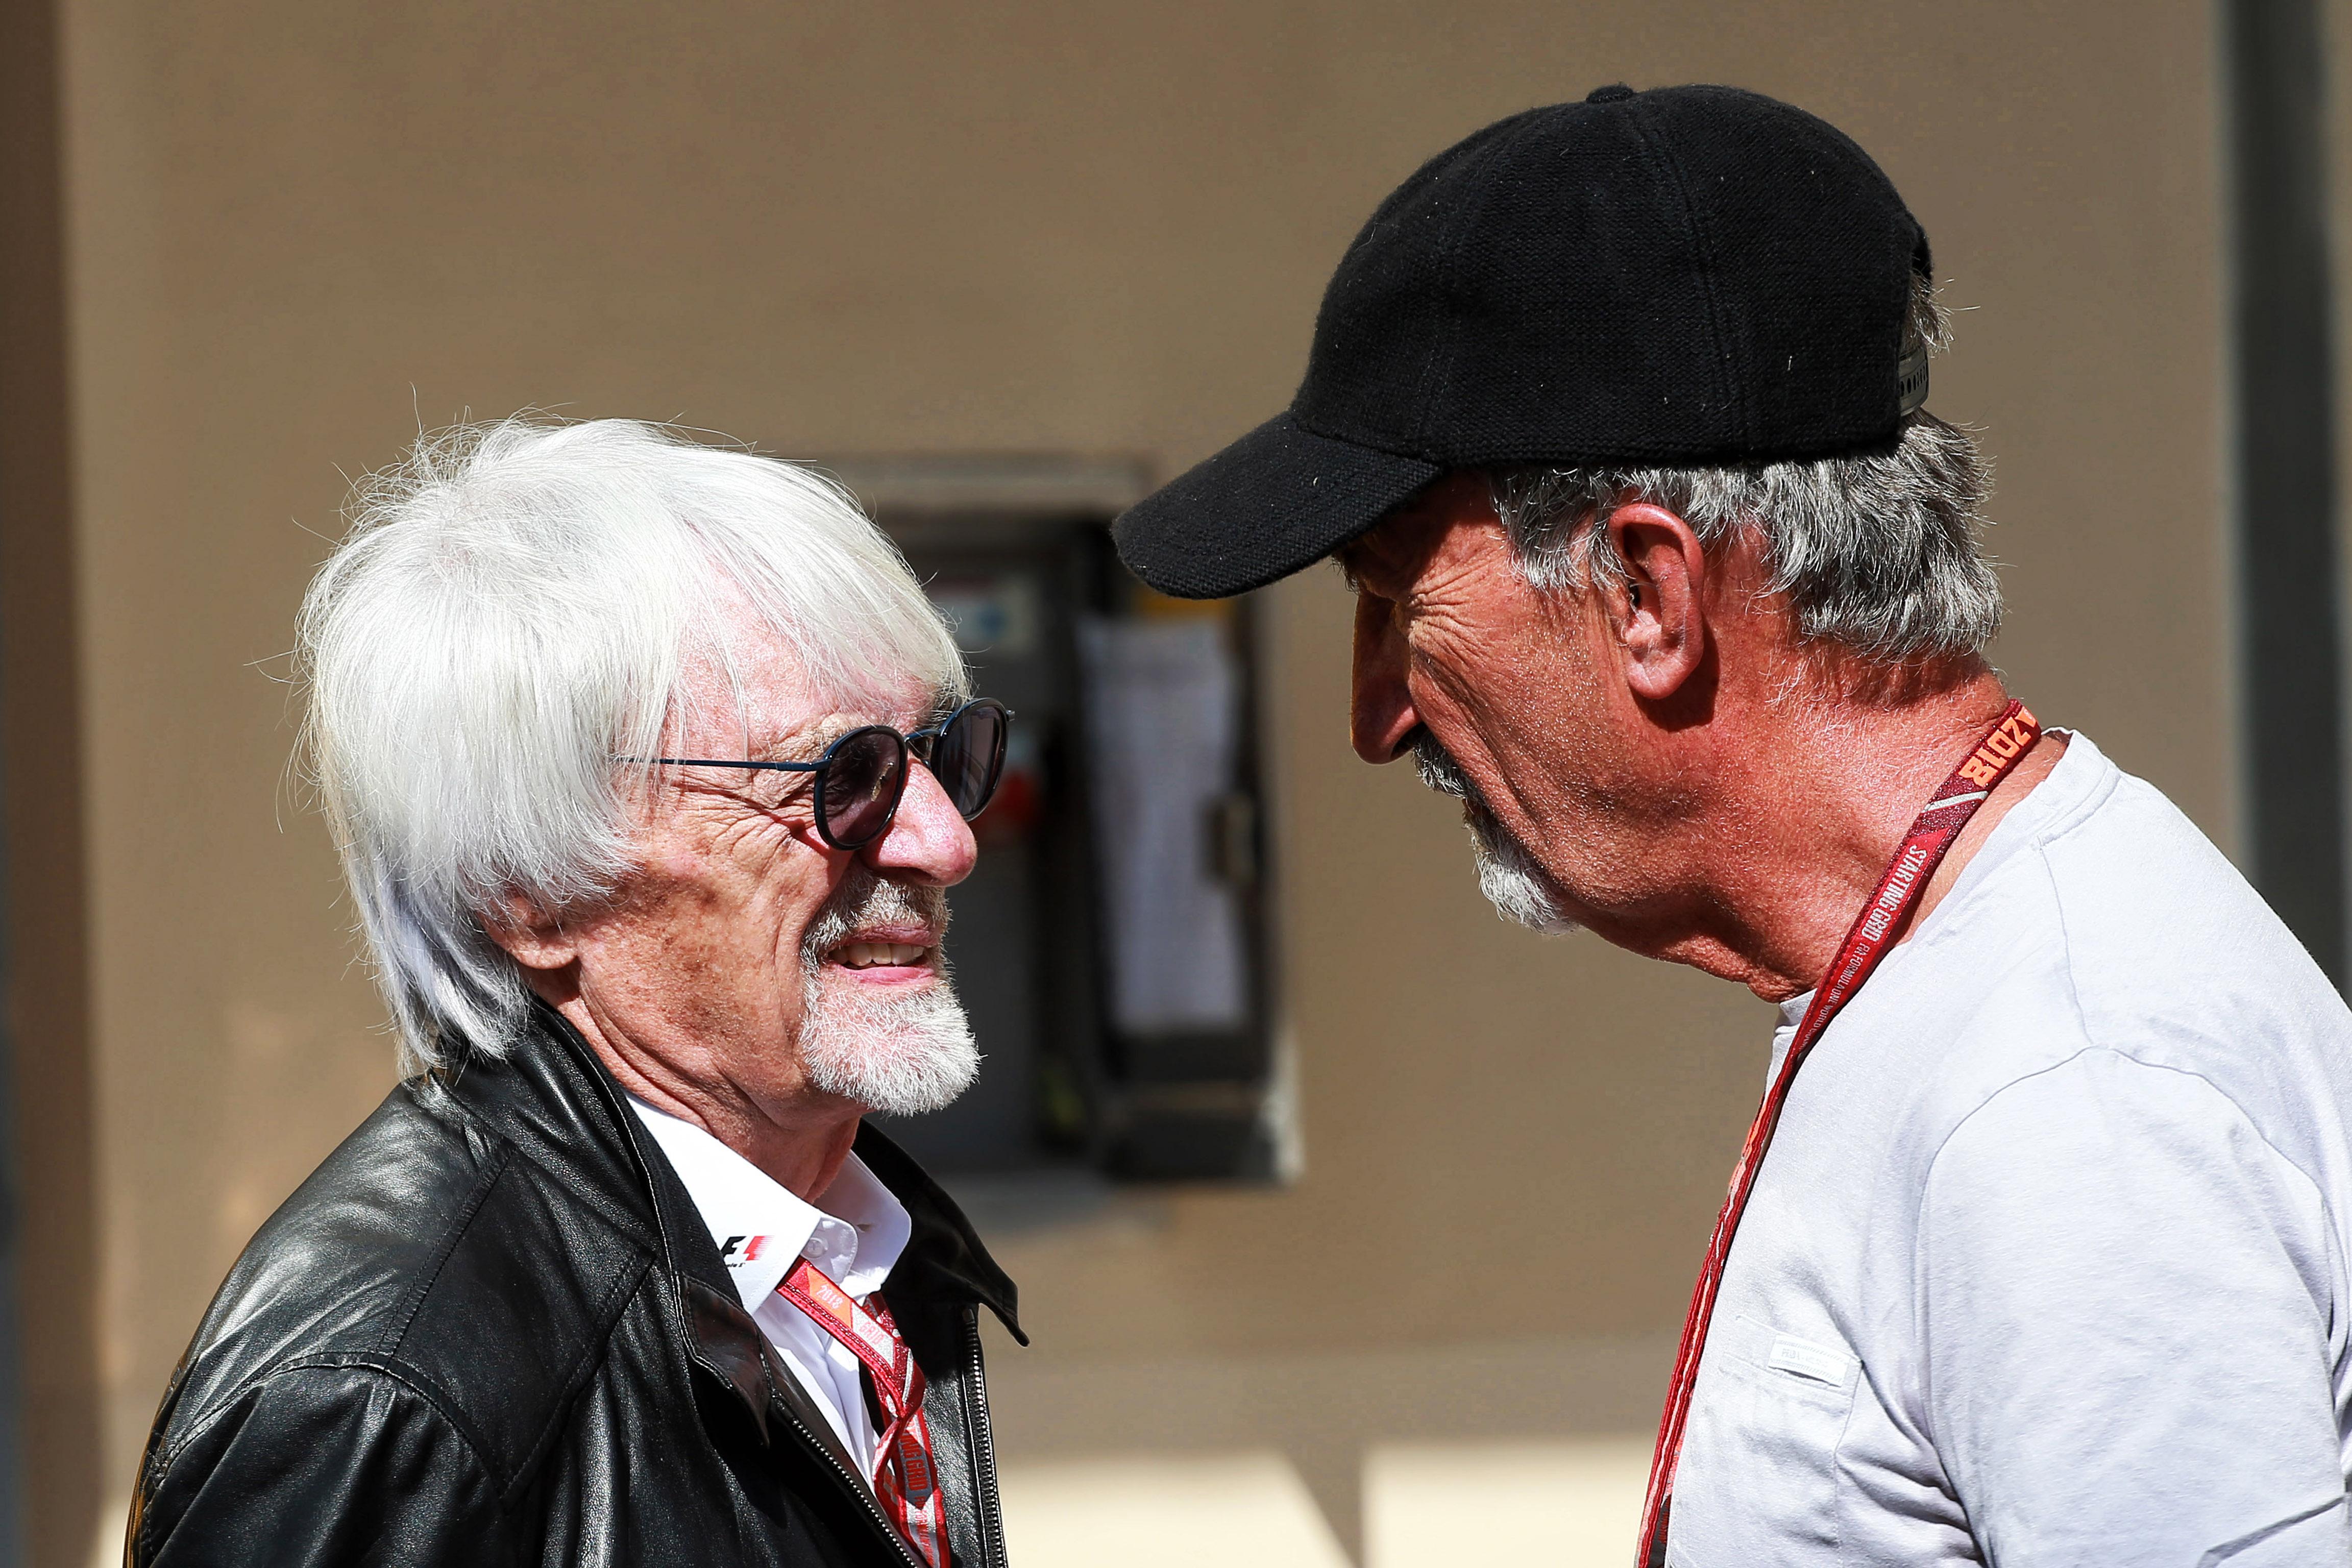 Motor Racing Formula One World Championship Abu Dhabi Grand Prix Practice Day Abu Dhabi, Uae